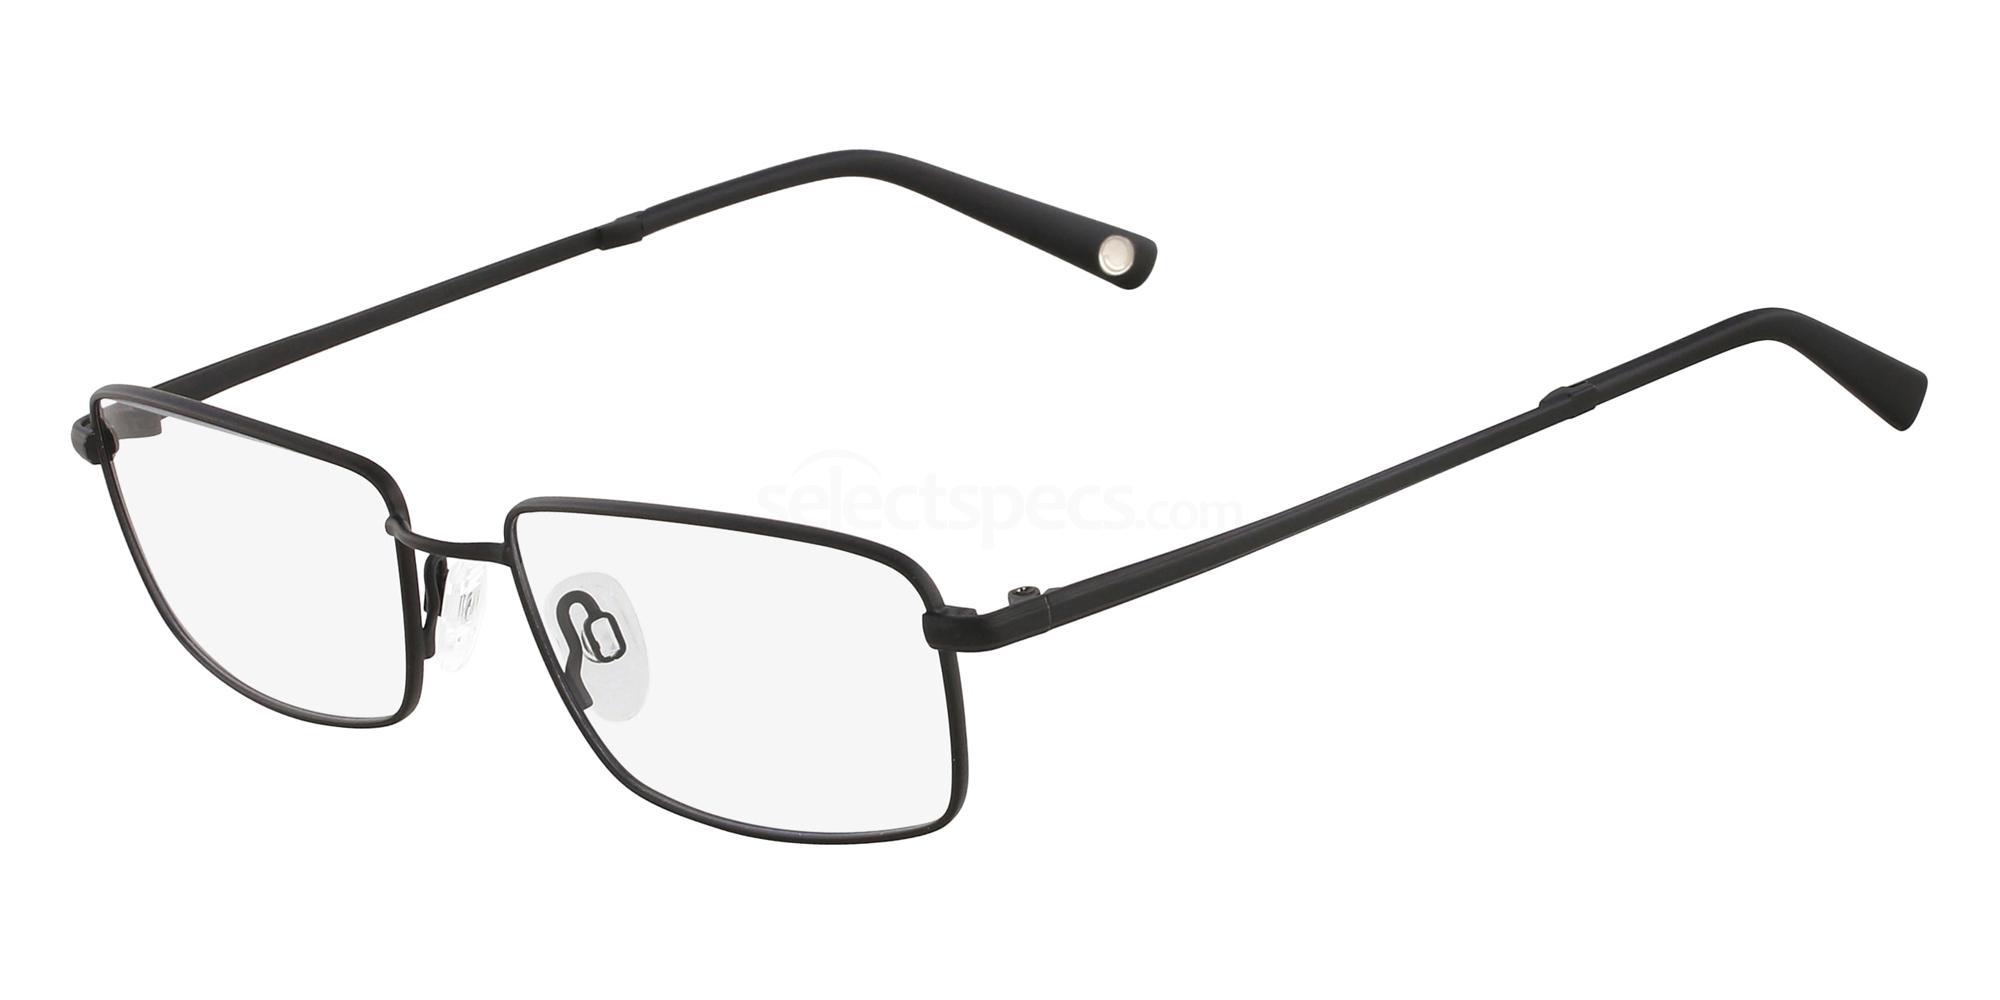 001 FLEXON BENEDICT 600 Glasses, Flexon